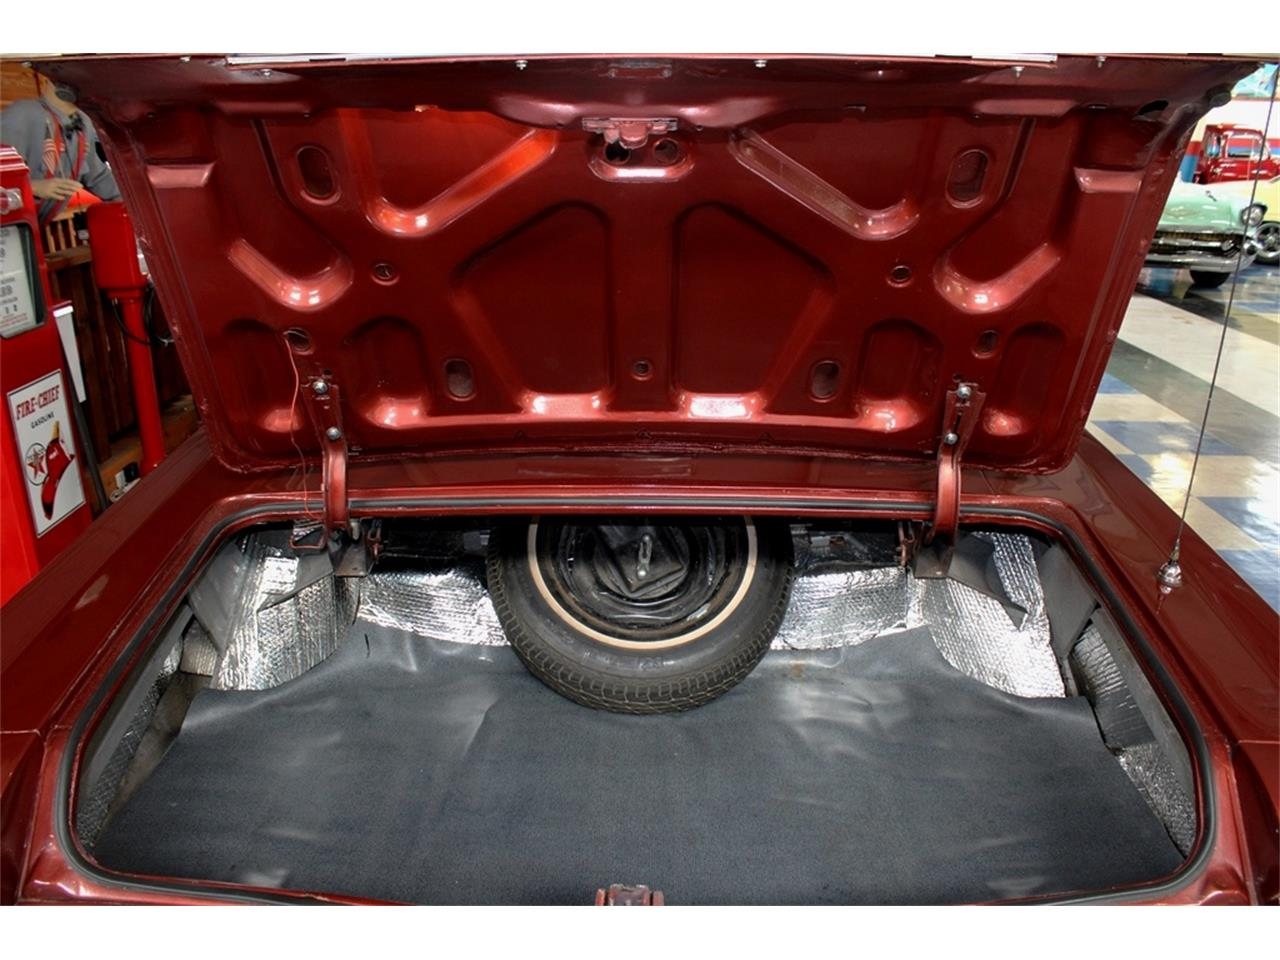 1966 Chevrolet Impala (CC-1266063) for sale in New Braunfels, Texas